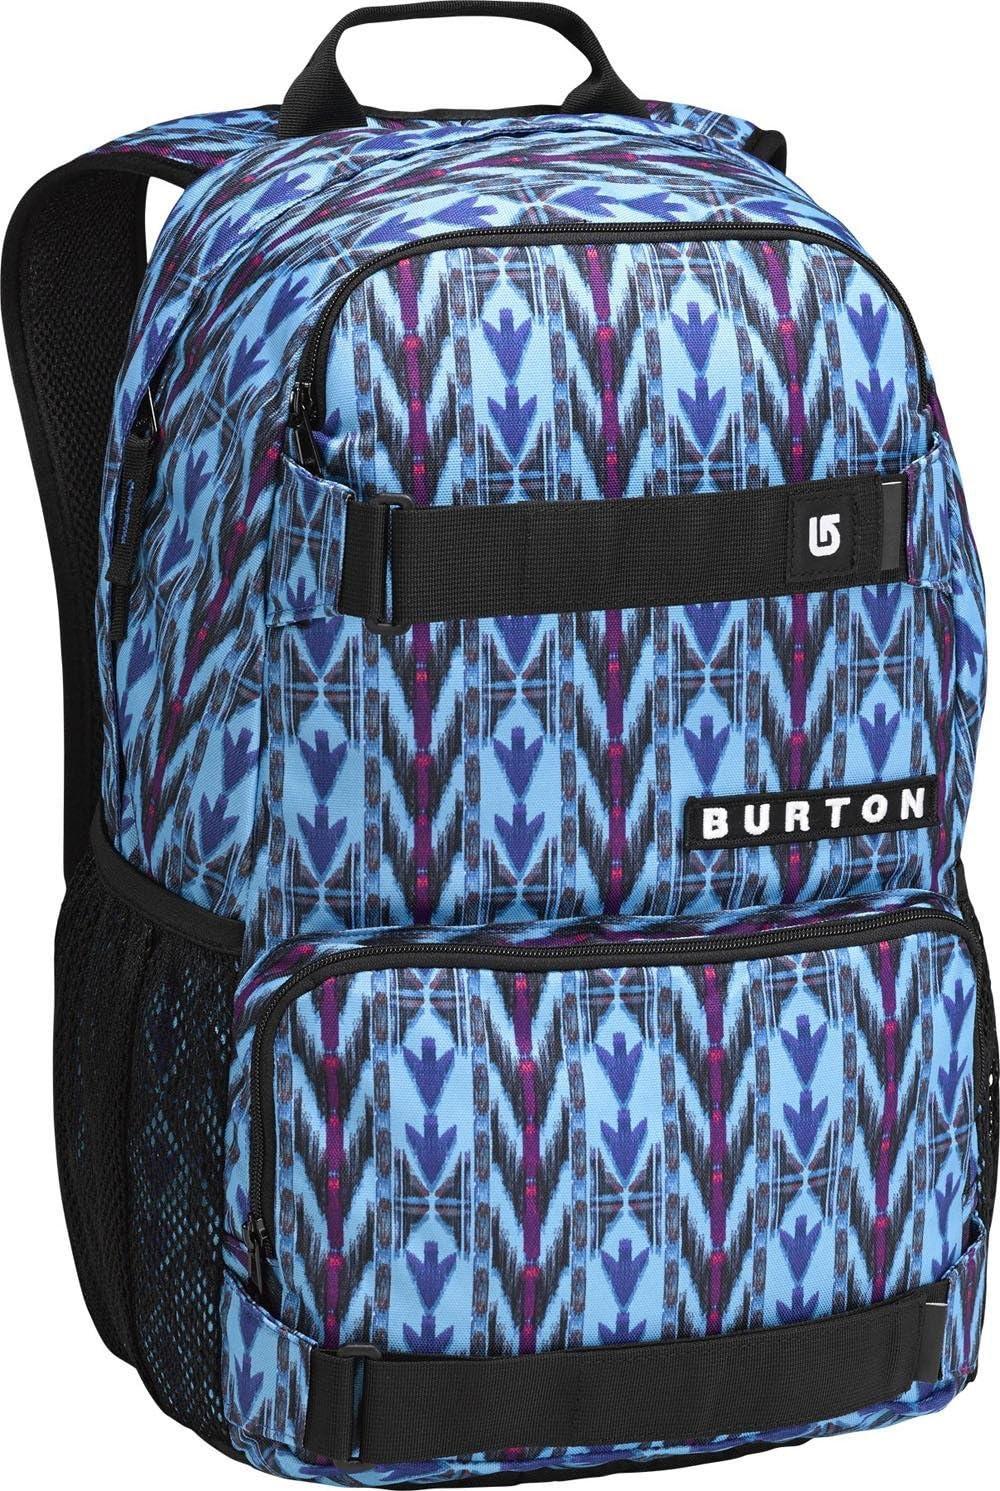 Burton Treble Yell Pack - Mochila Multicolor Blue-Ray Noveau Neon ...